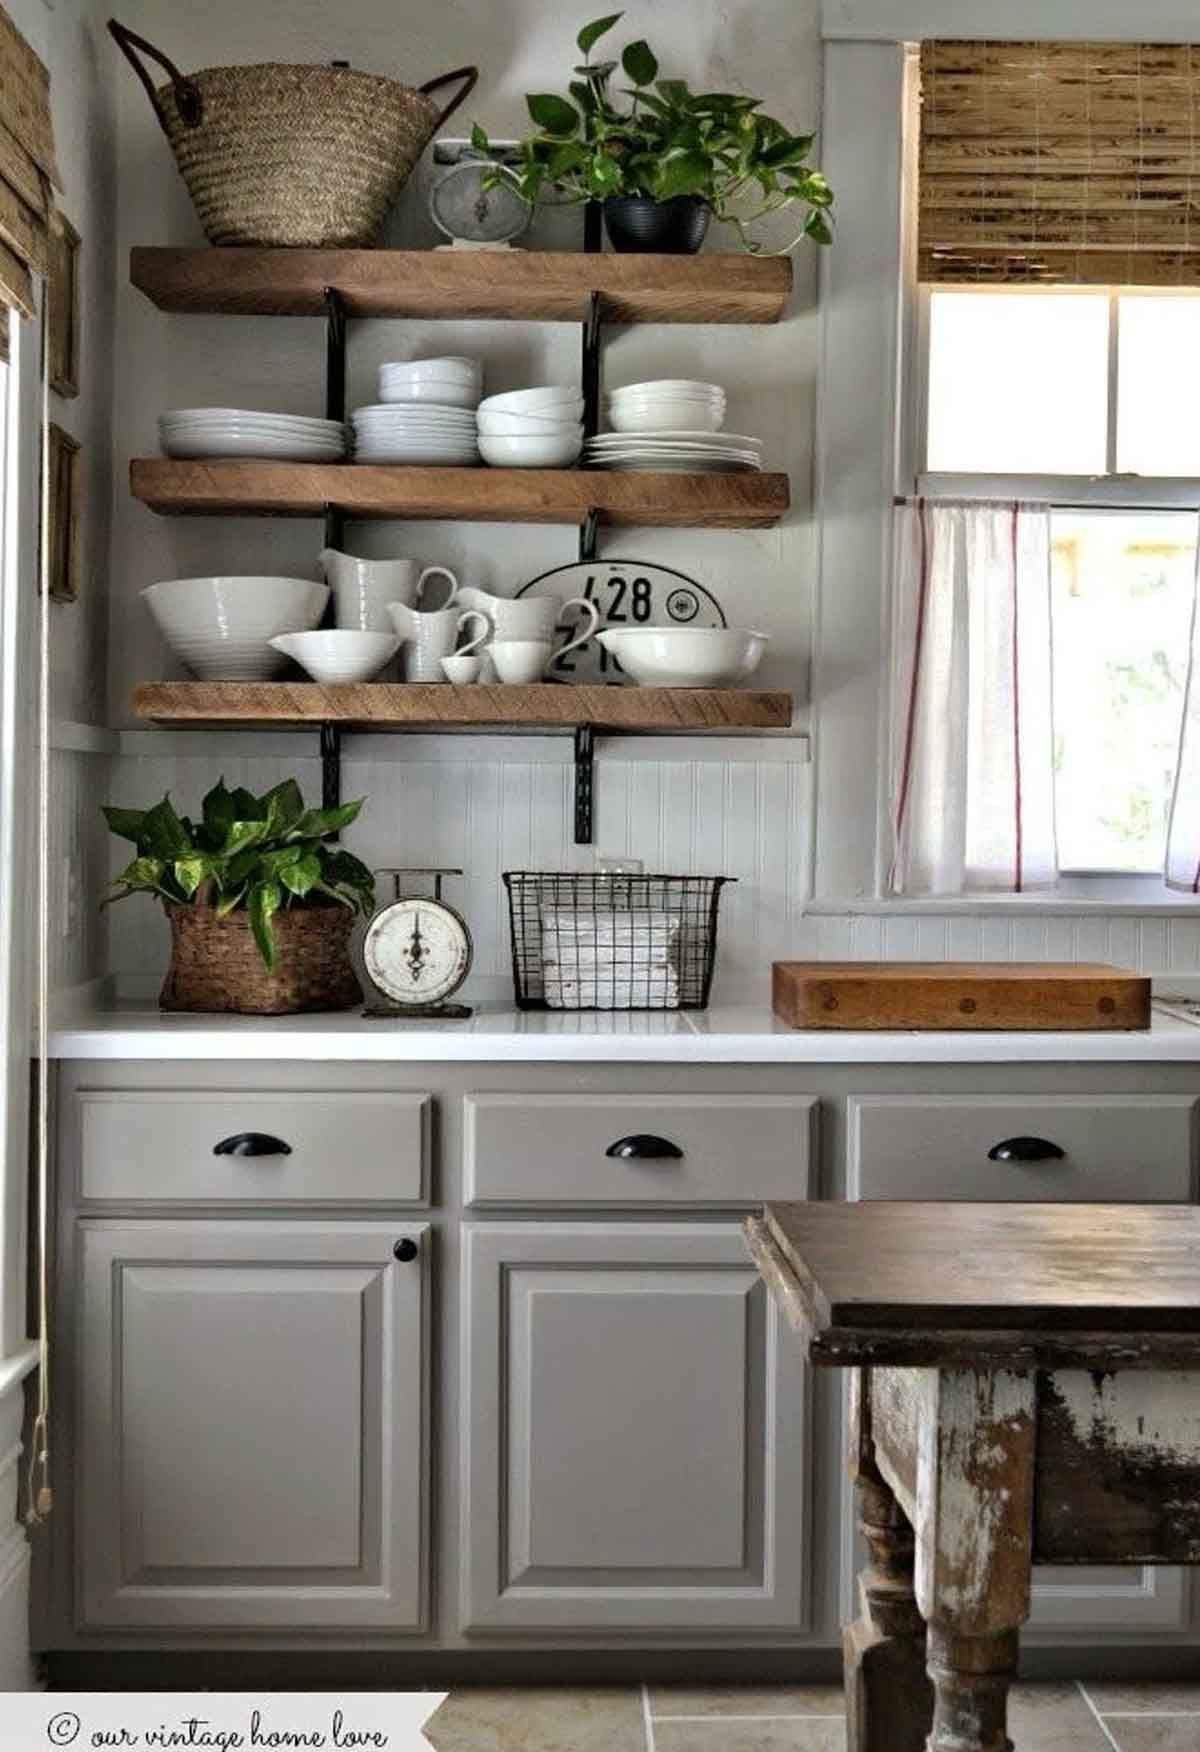 Pin By Tarja Makela On Birchwood In 2020 Kitchen Cabinets Makeover New Kitchen Cabinets Kitchen Renovation